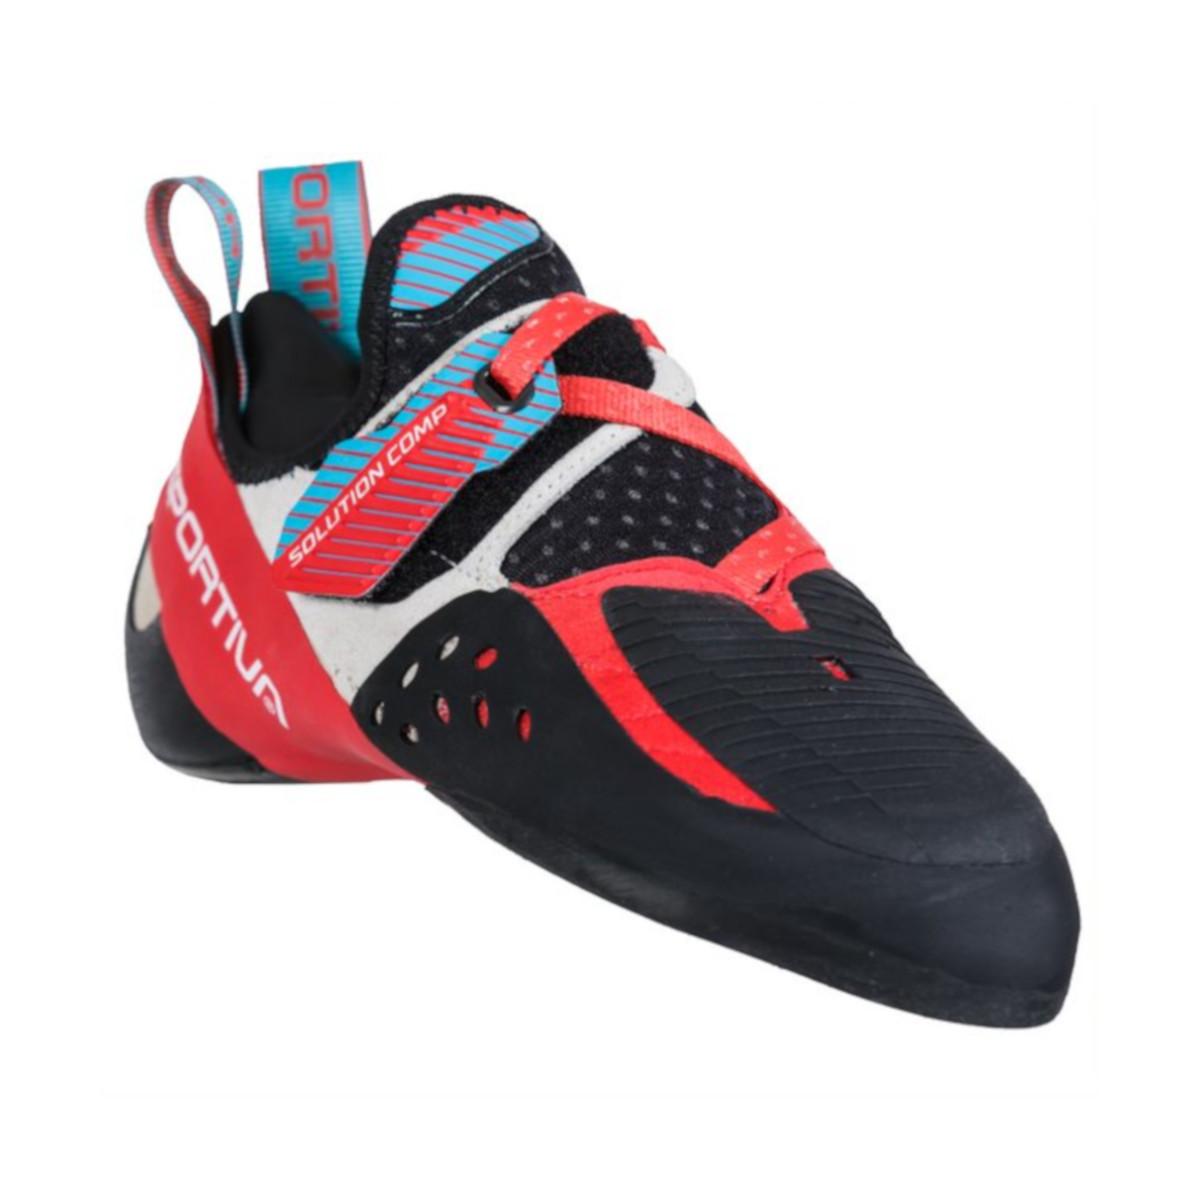 La Sportiva Solution Comp Climbing Shoe